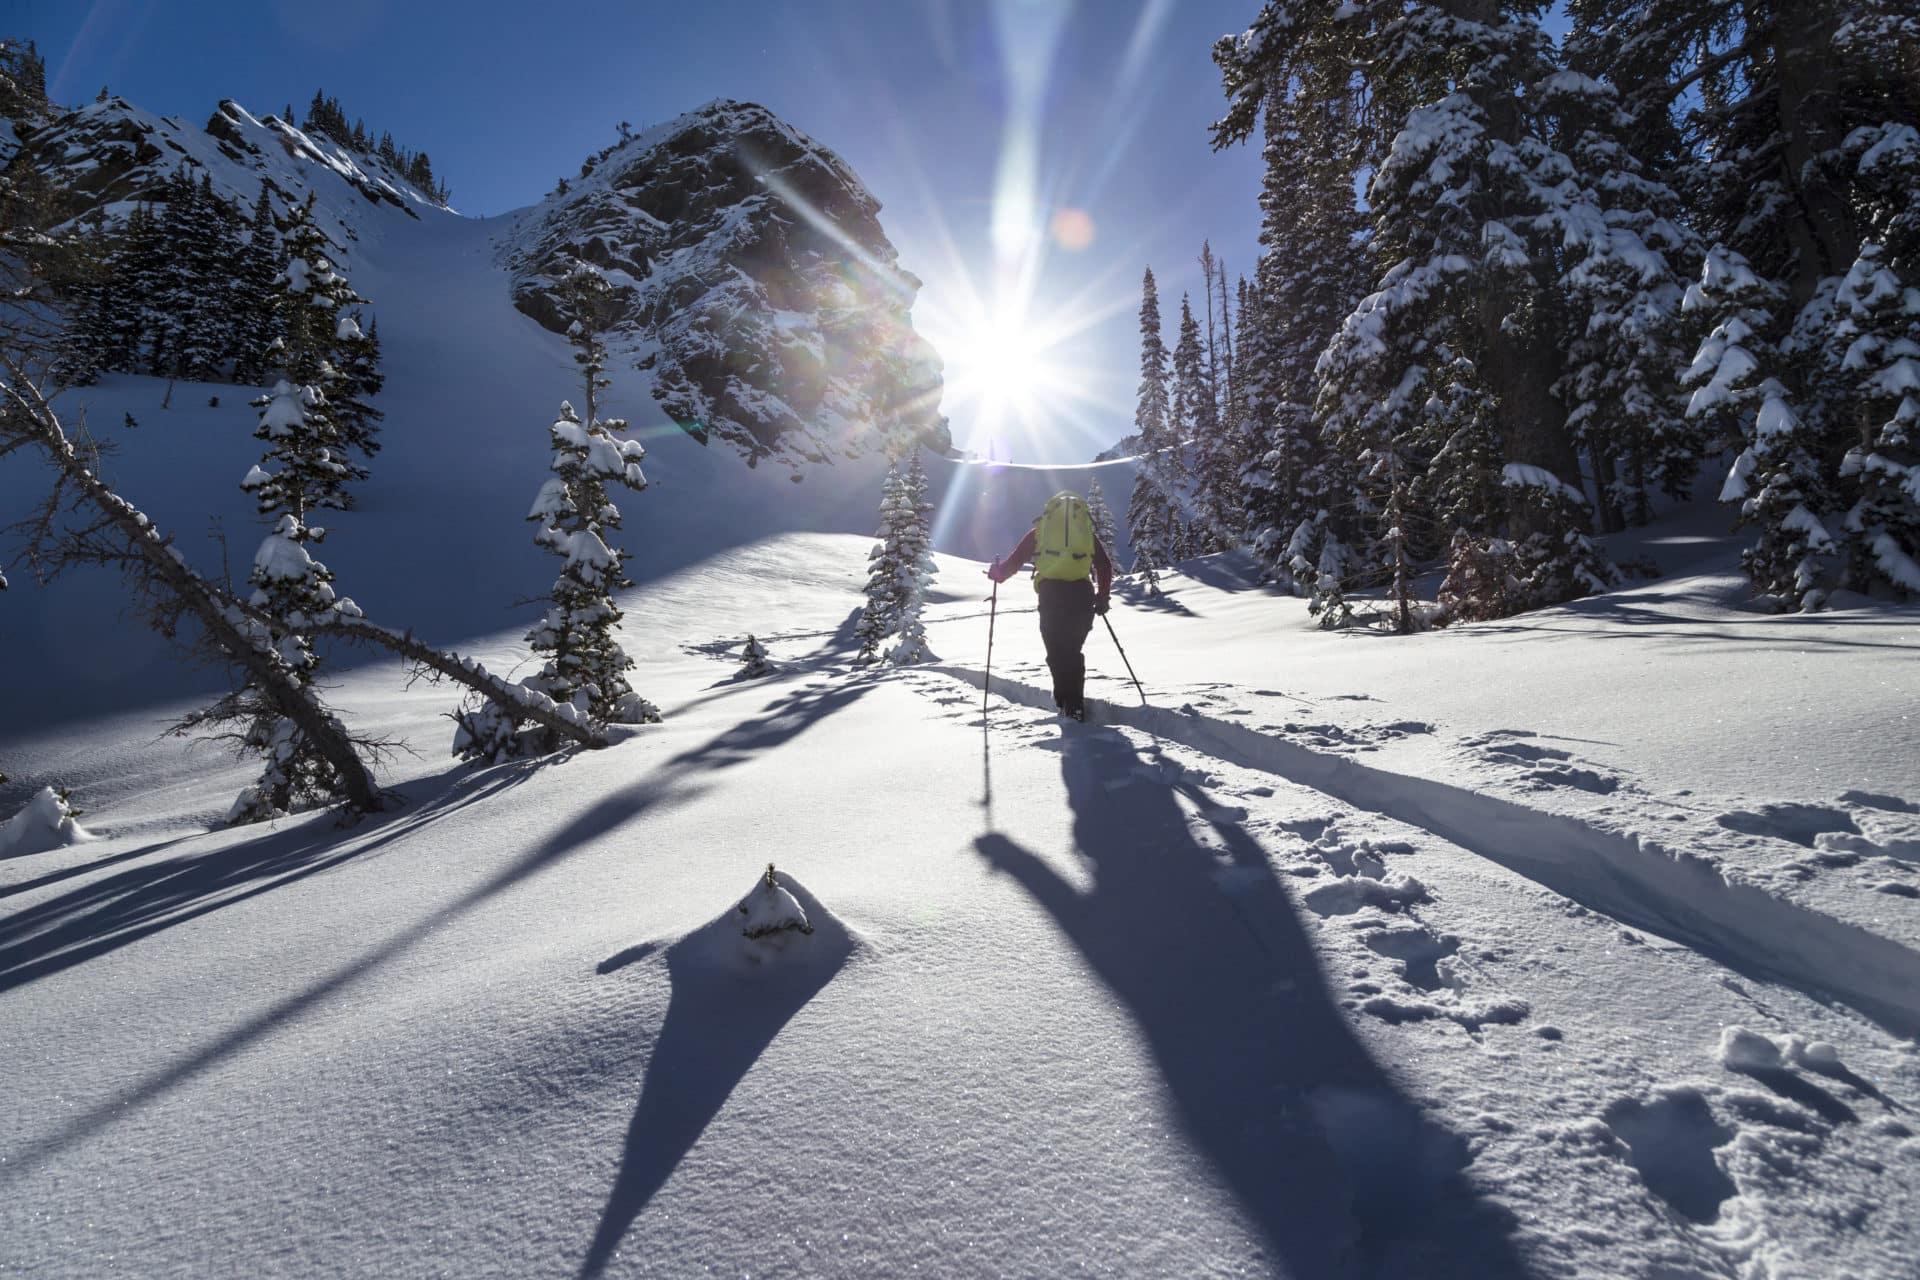 Utah's Wasatch Mountains backcountry ski days